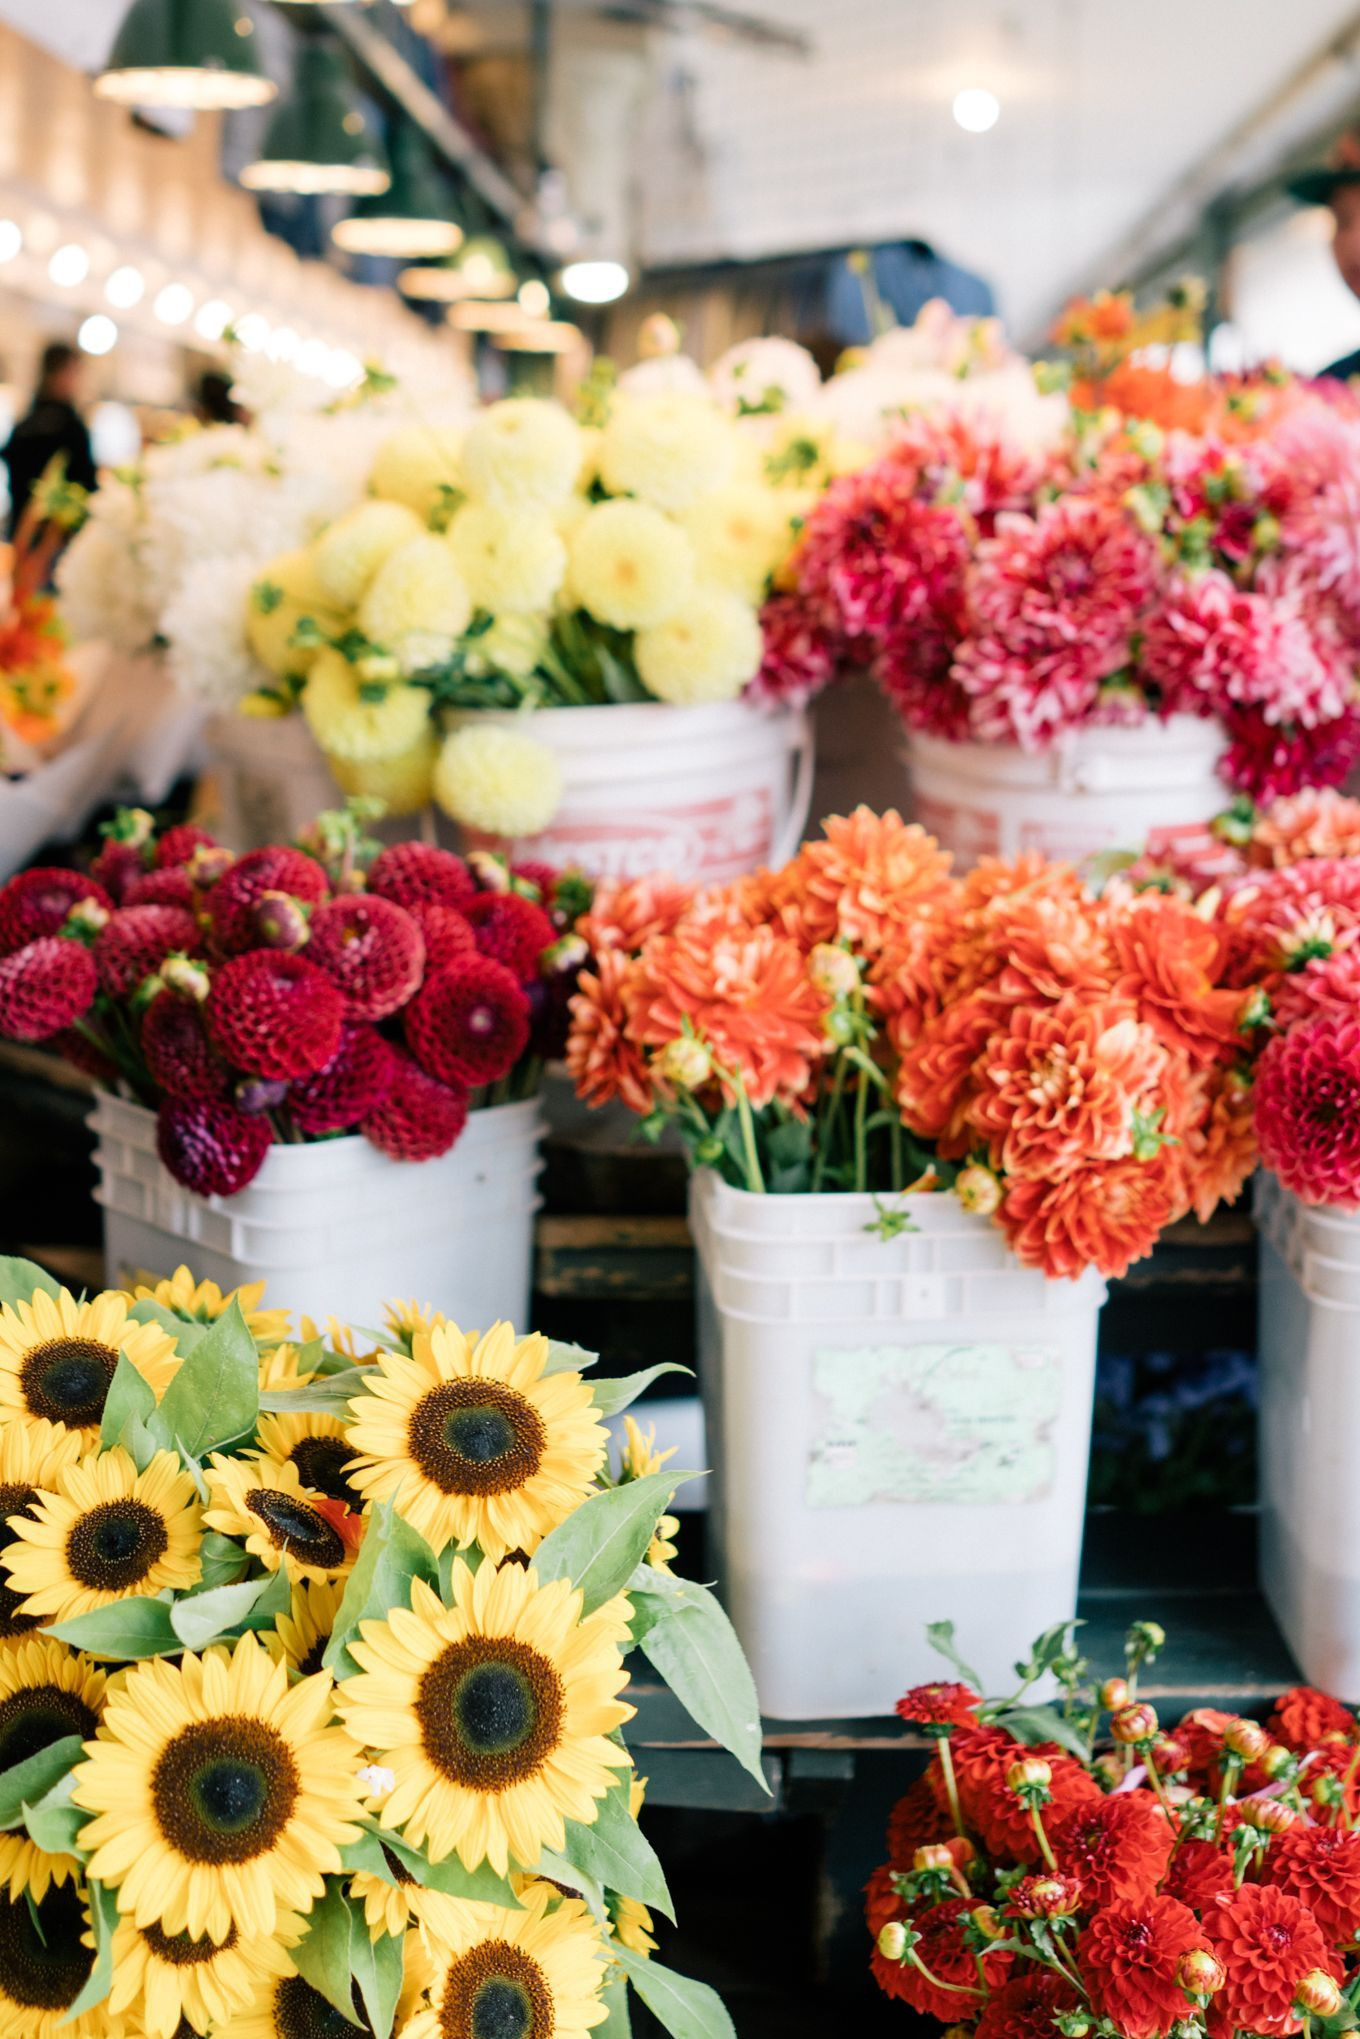 Fresh flowers at Pike s Place Markets Seattle WA